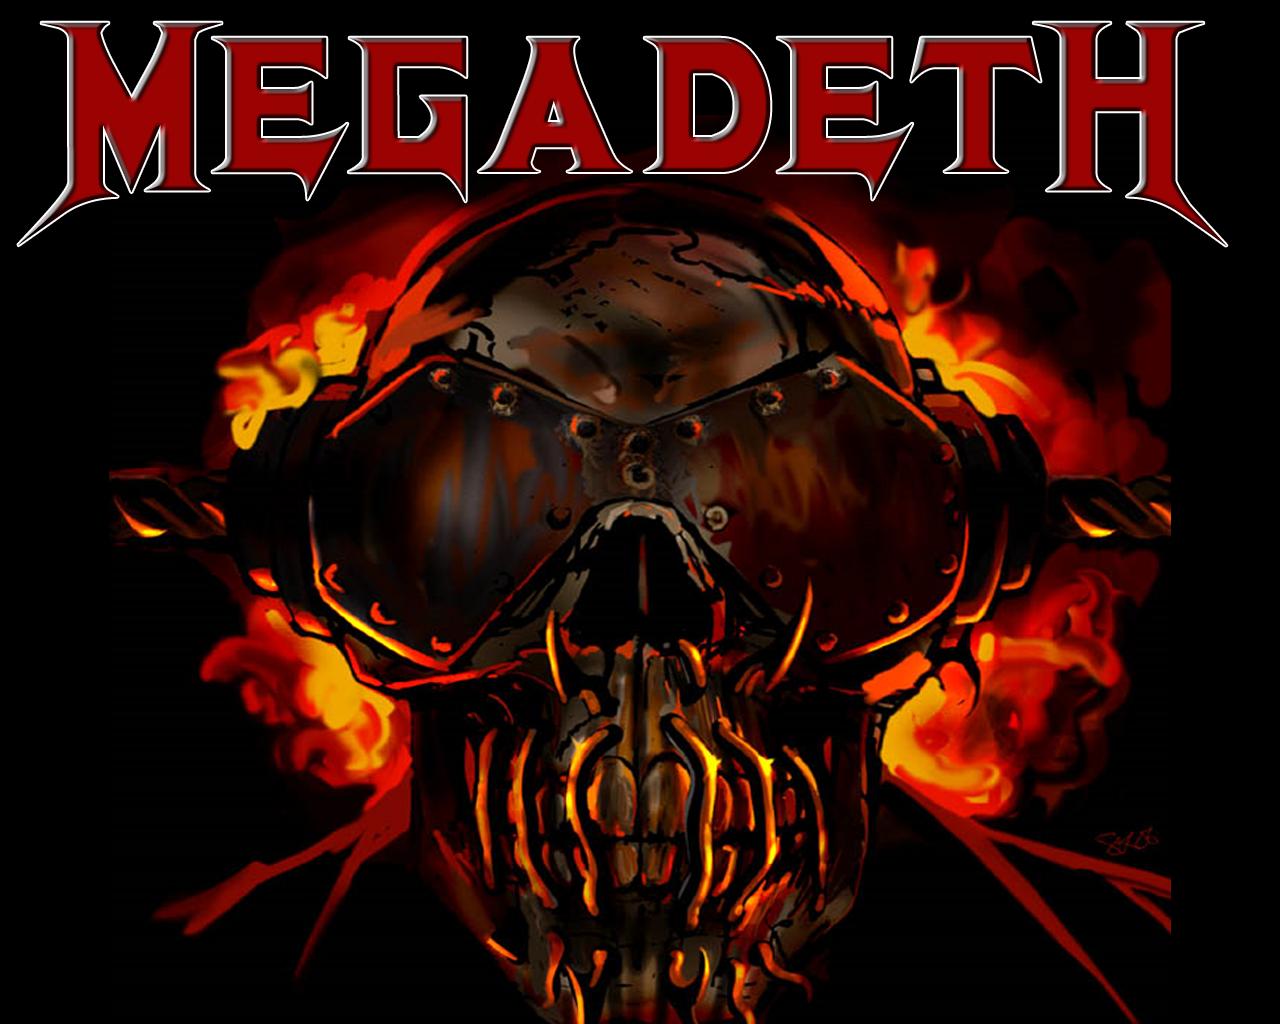 Megadeth Wallpaper Megadeth Megadeth Heavy Metal Bands Metal Bands